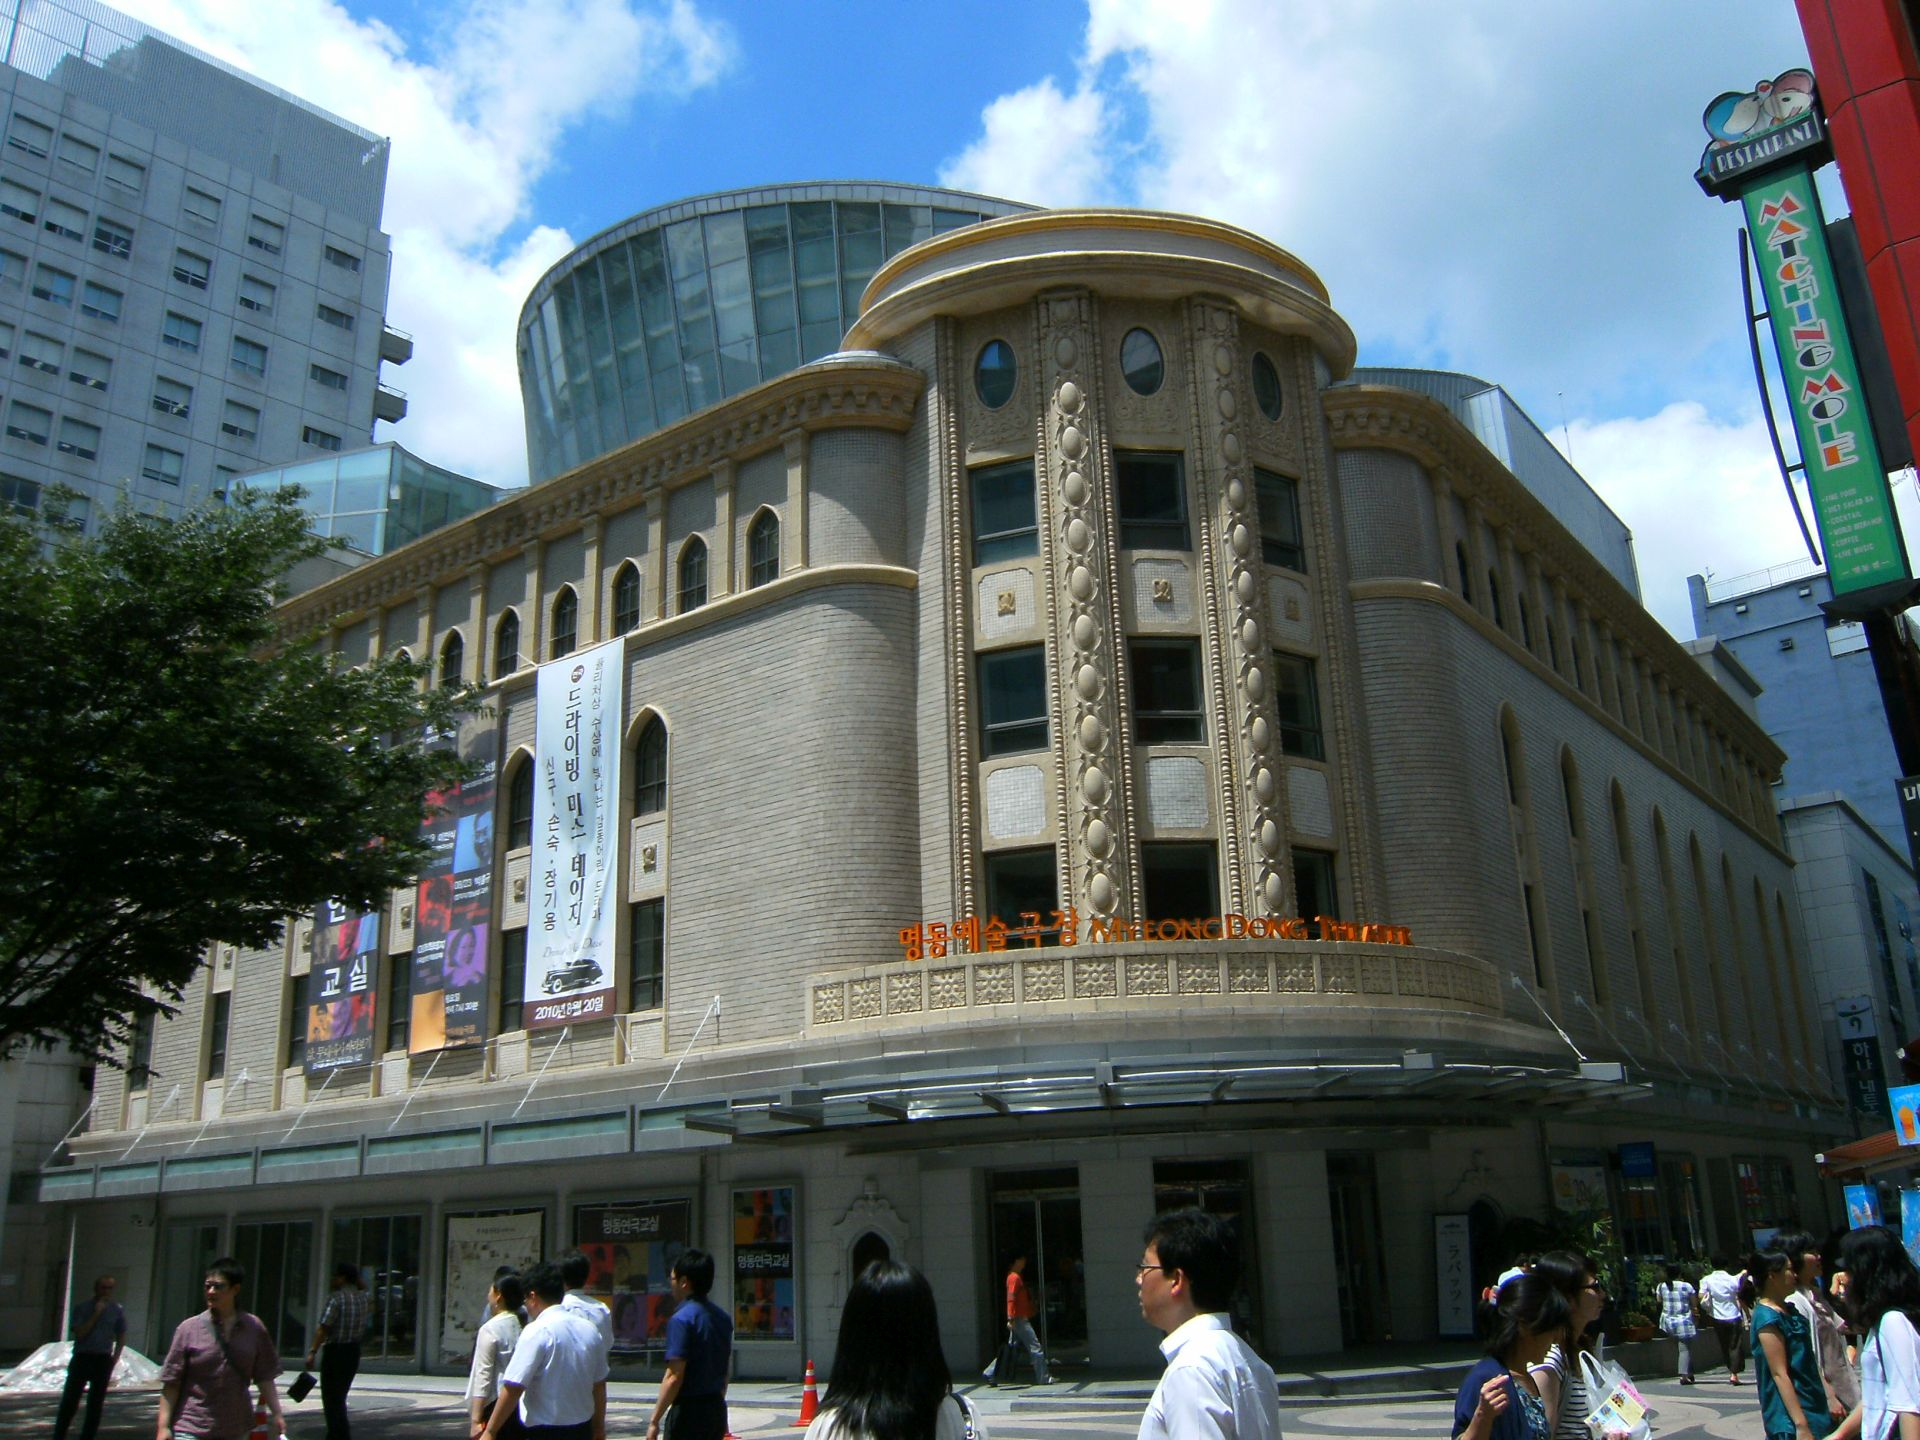 Myung Dong Theater, Myung Dong, Südkorea